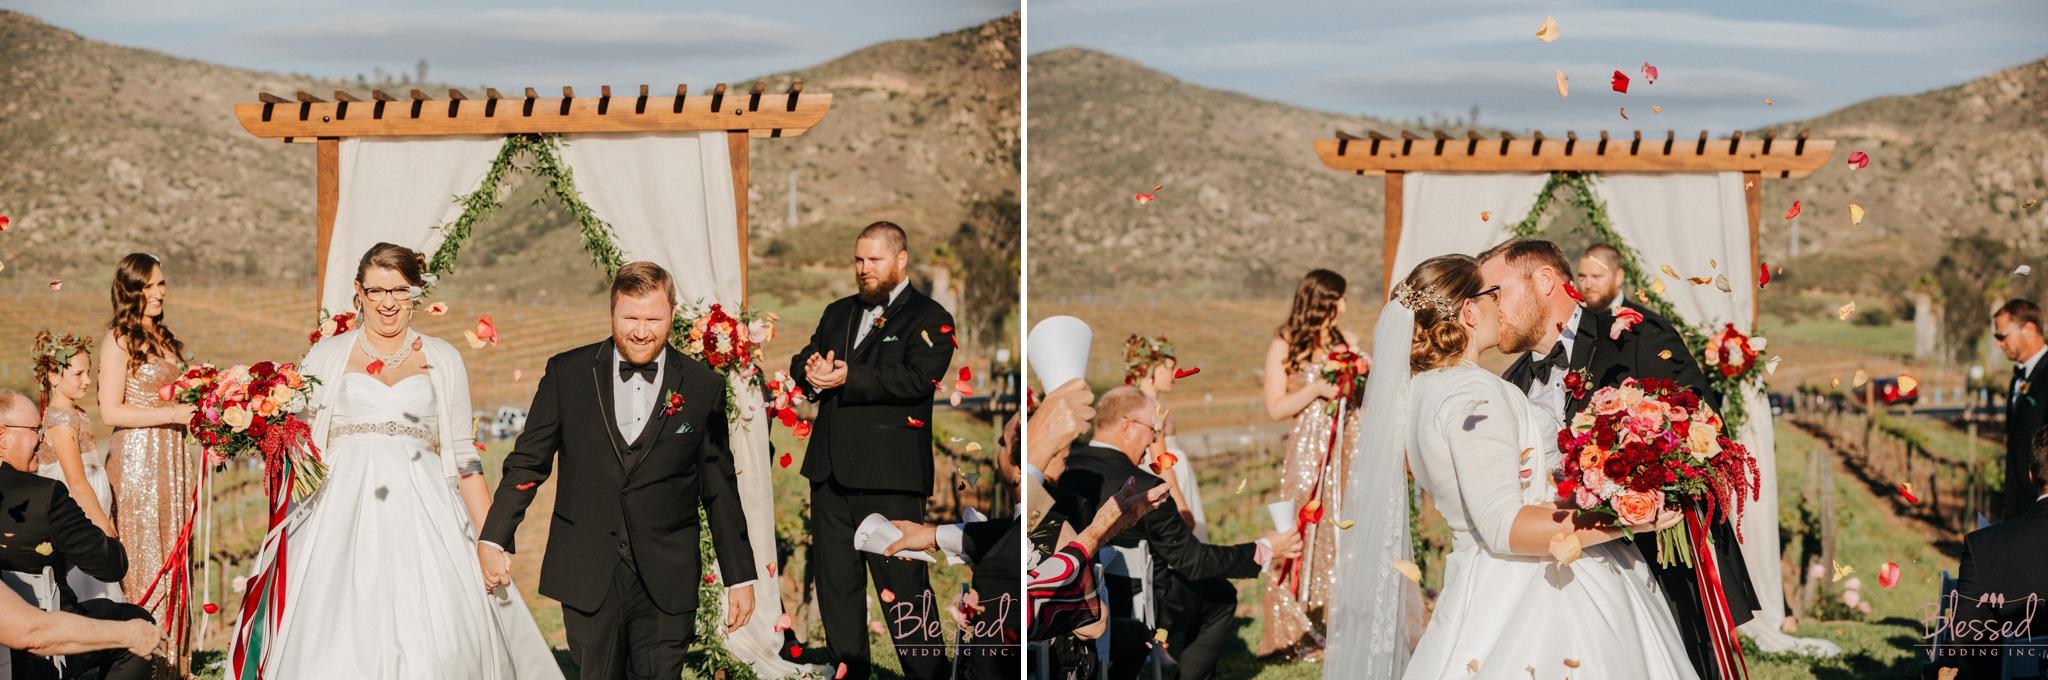 Orfila Vinery Wedding Temecula Wedding Photographer 20.jpg